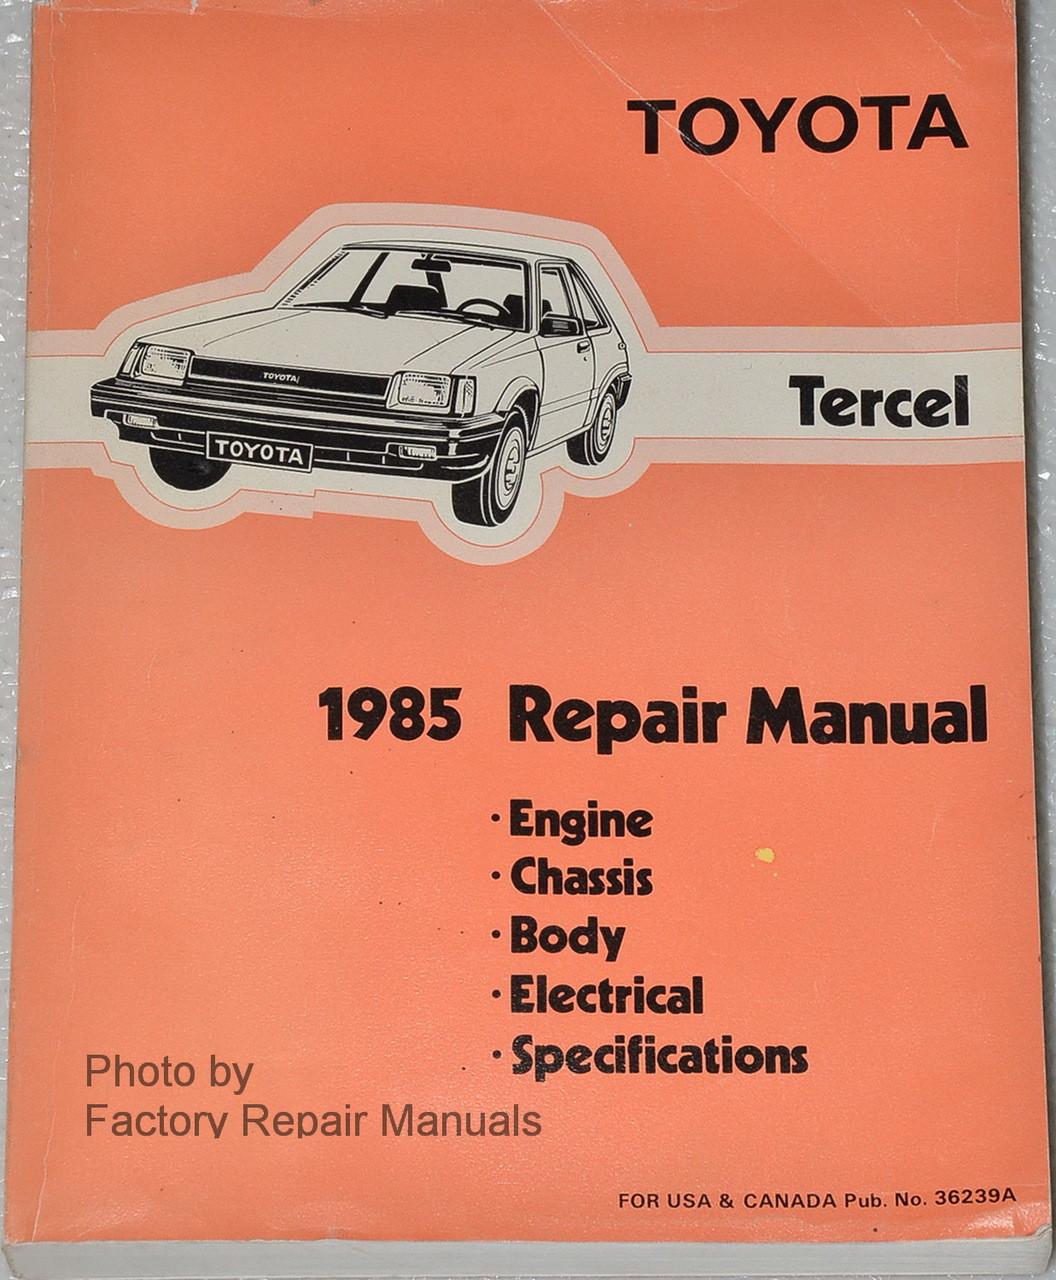 1985 Toyota Tercel Factory Service Manual Original Shop